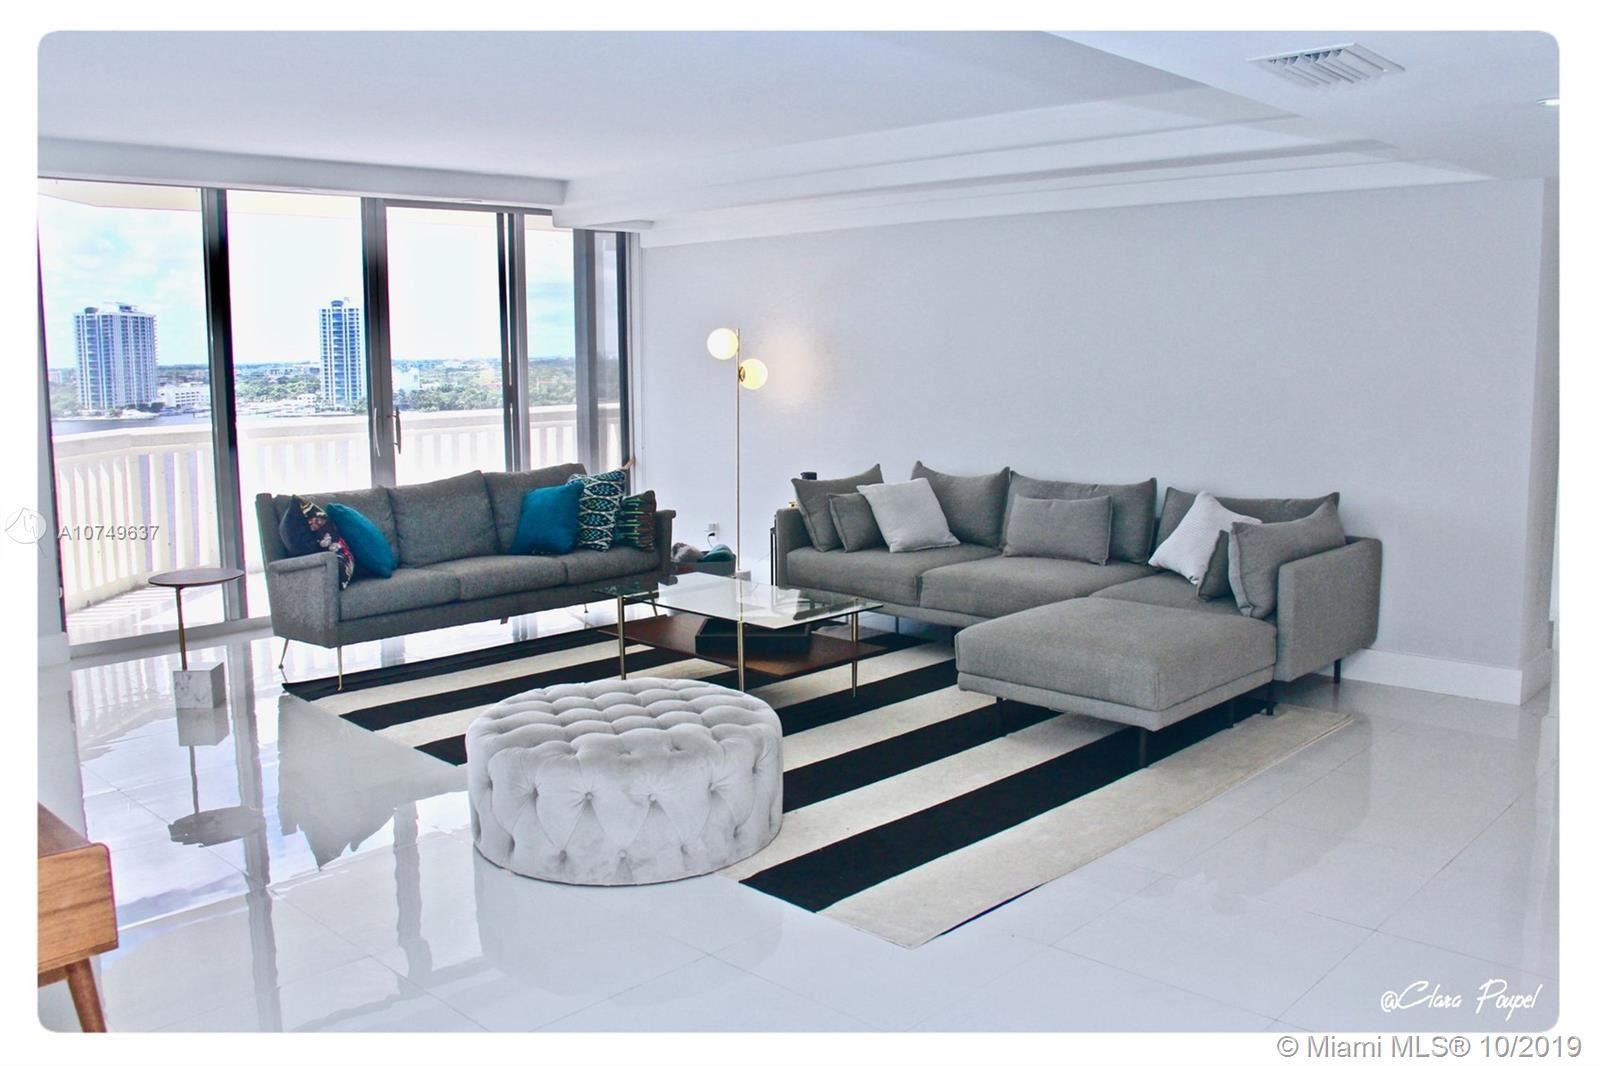 1000 W Island Blvd #1502, Aventura, FL 33160 - #: A10749637